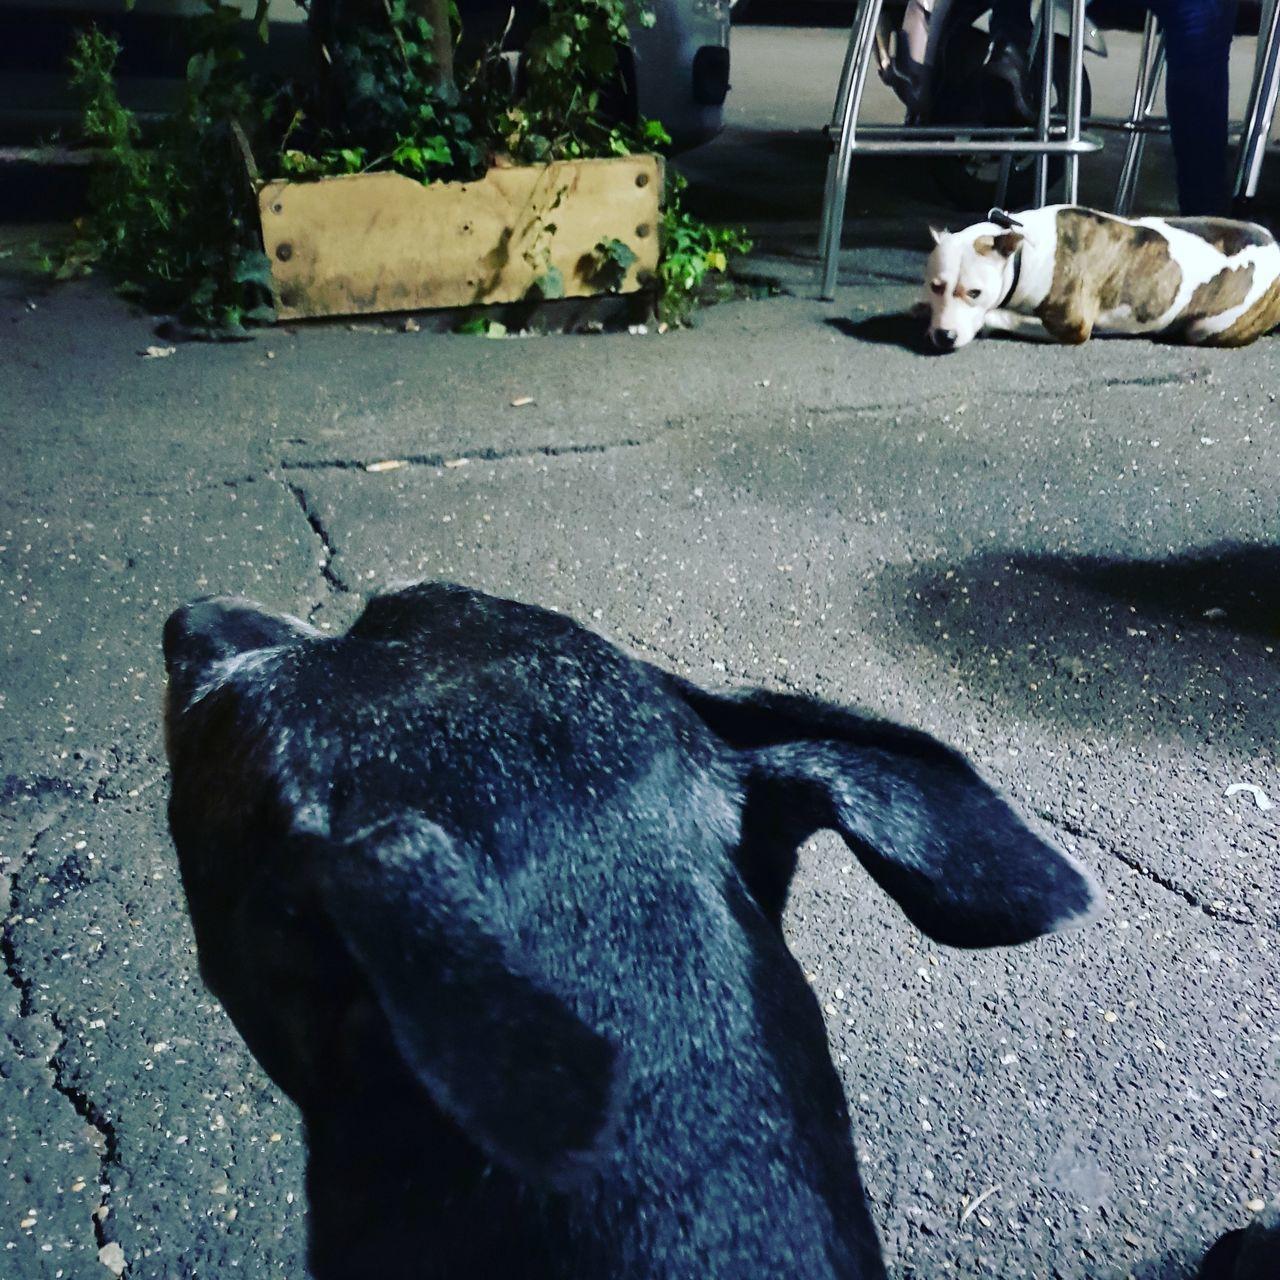 DOG SLEEPING IN THE ROAD